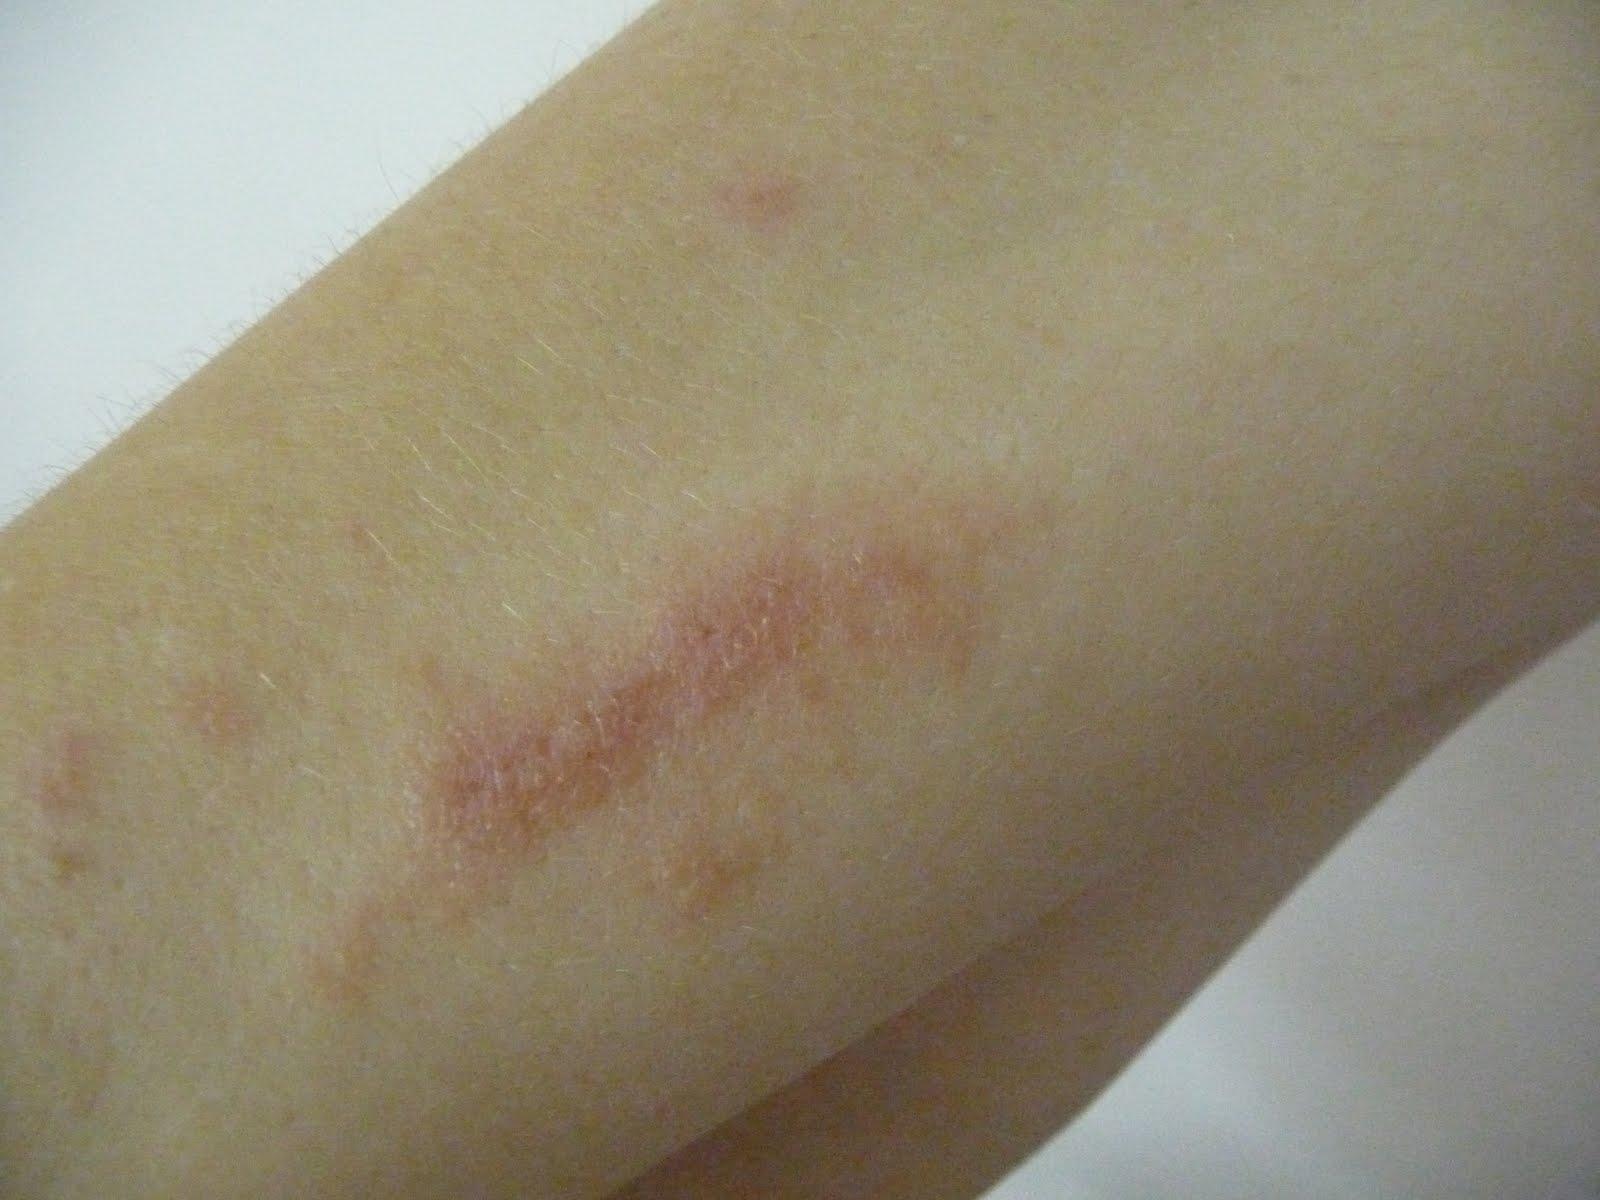 Poison ivy rash - Mayo Clinic